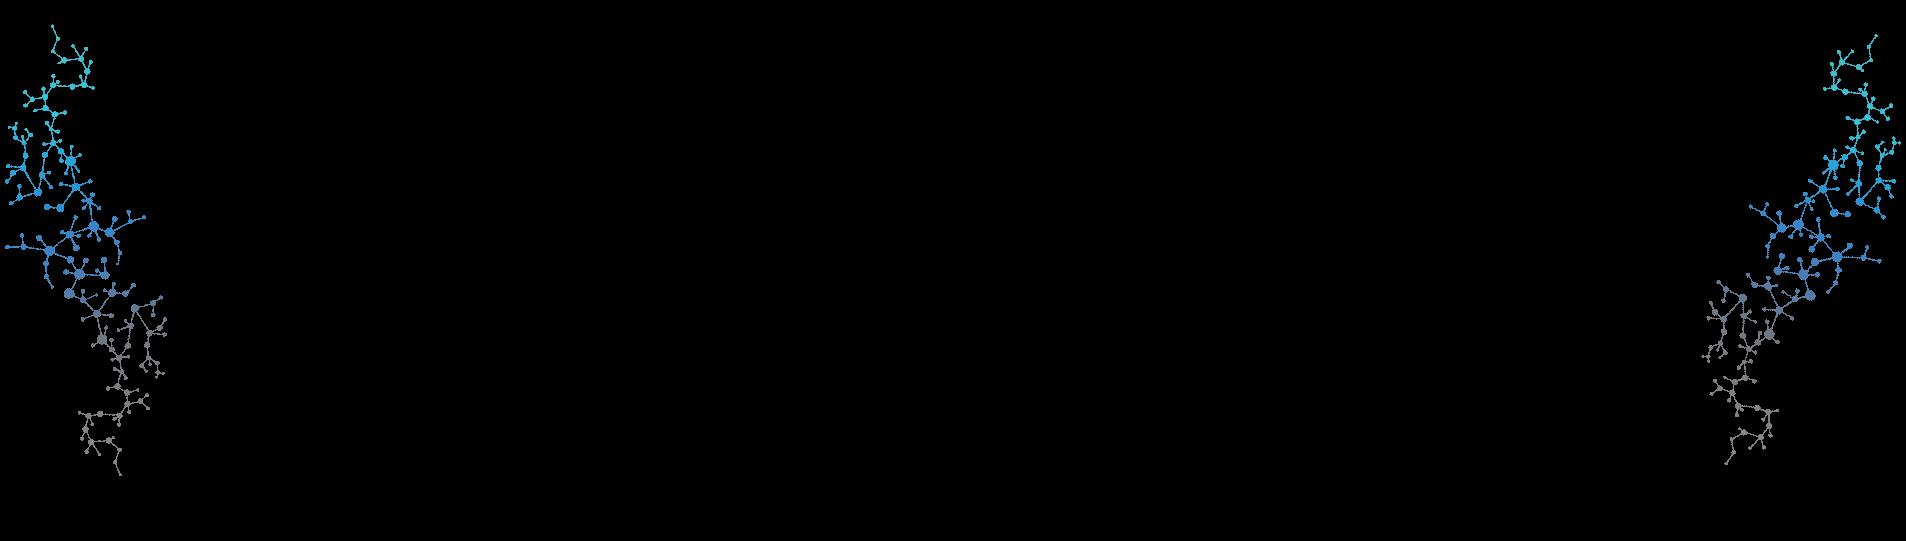 Web Gradient Background Menu 1.0